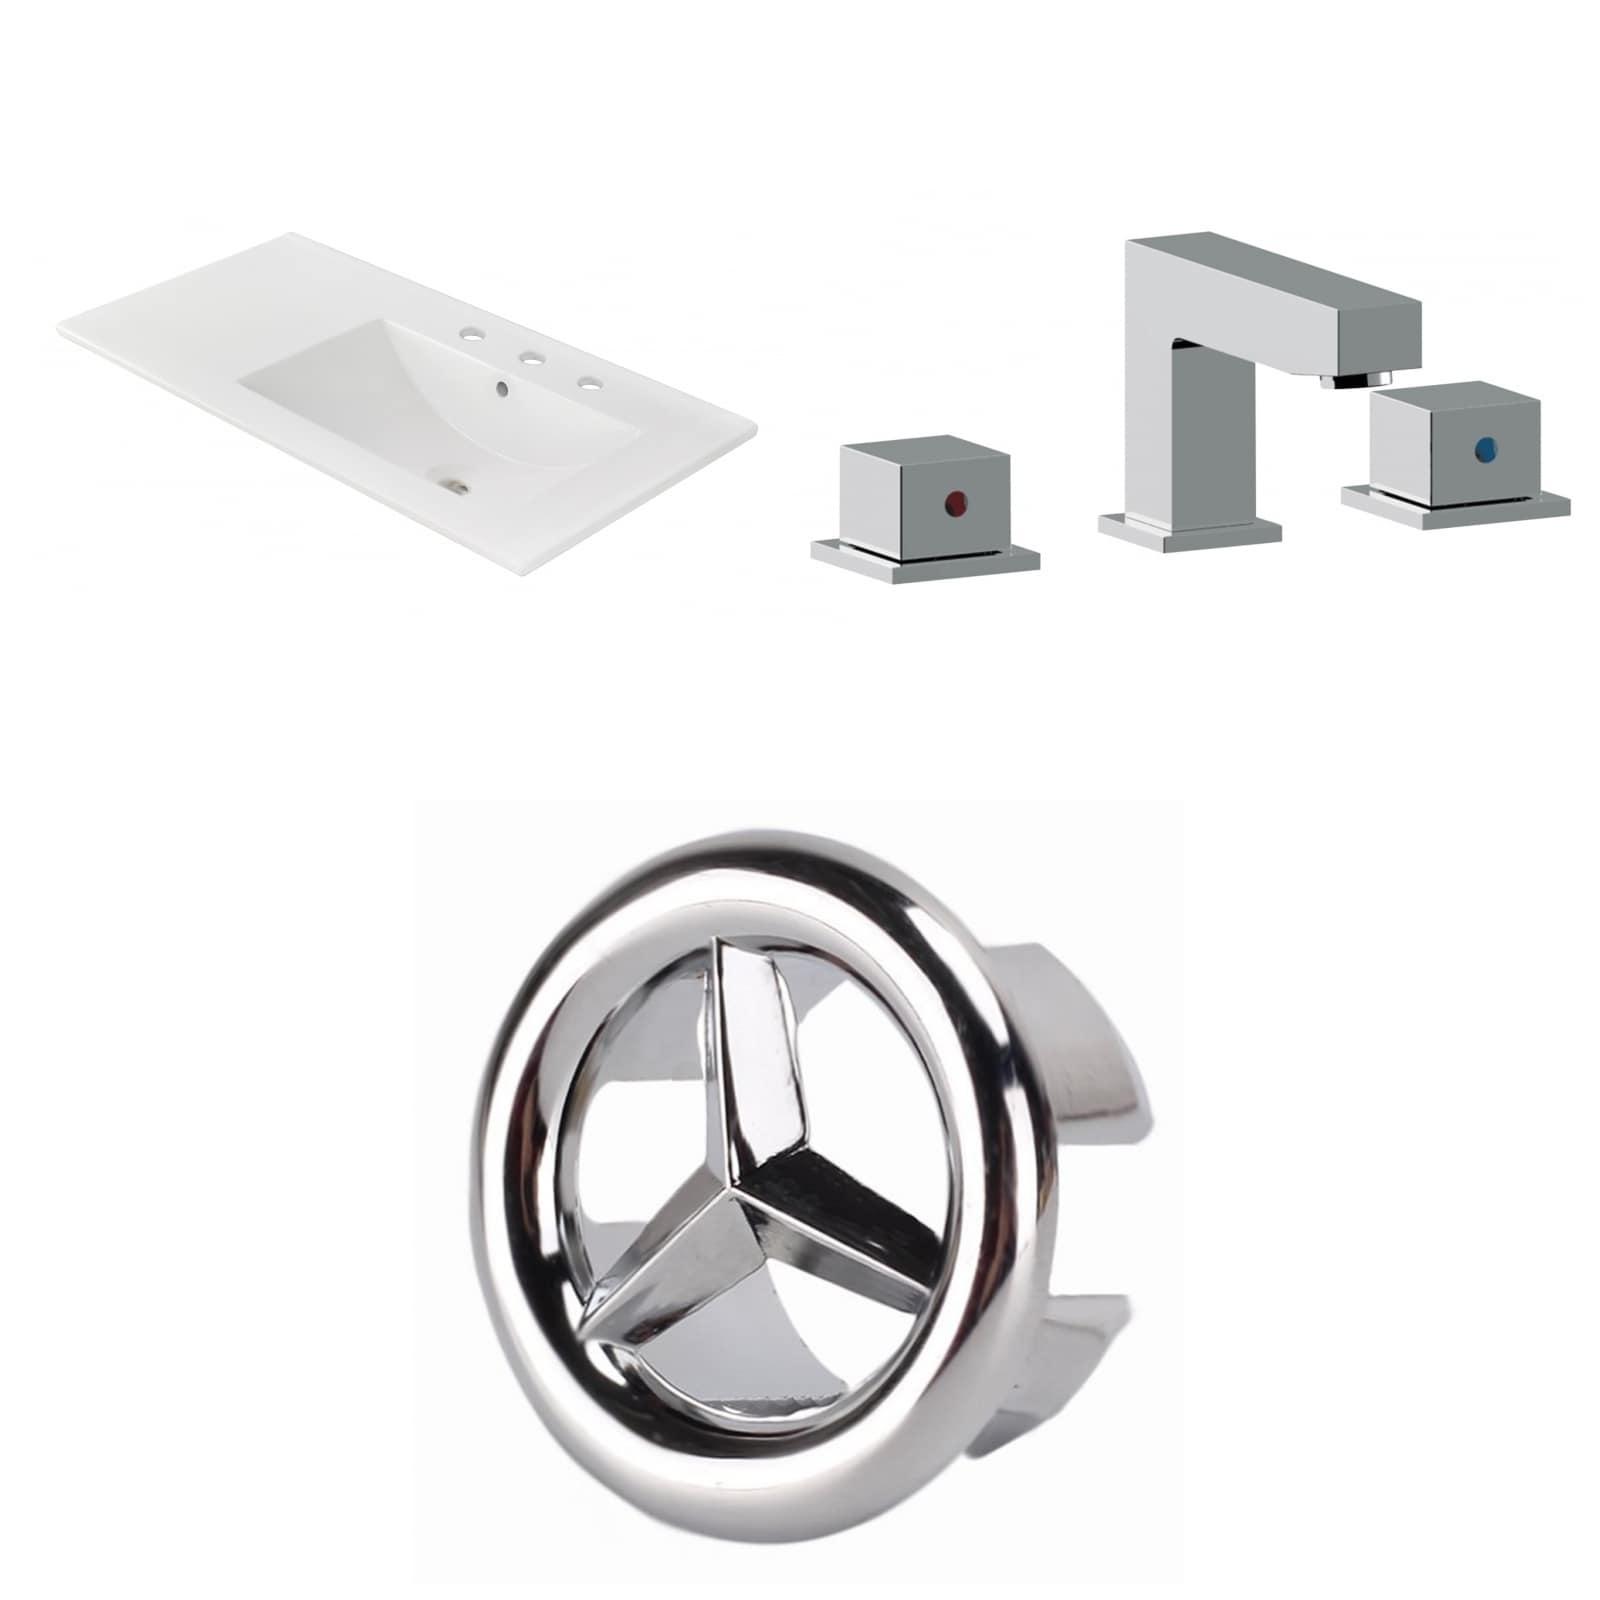 35.5-in. W 3H8-in. Ceramic Top Set In White Color - CUPC Faucet Incl.